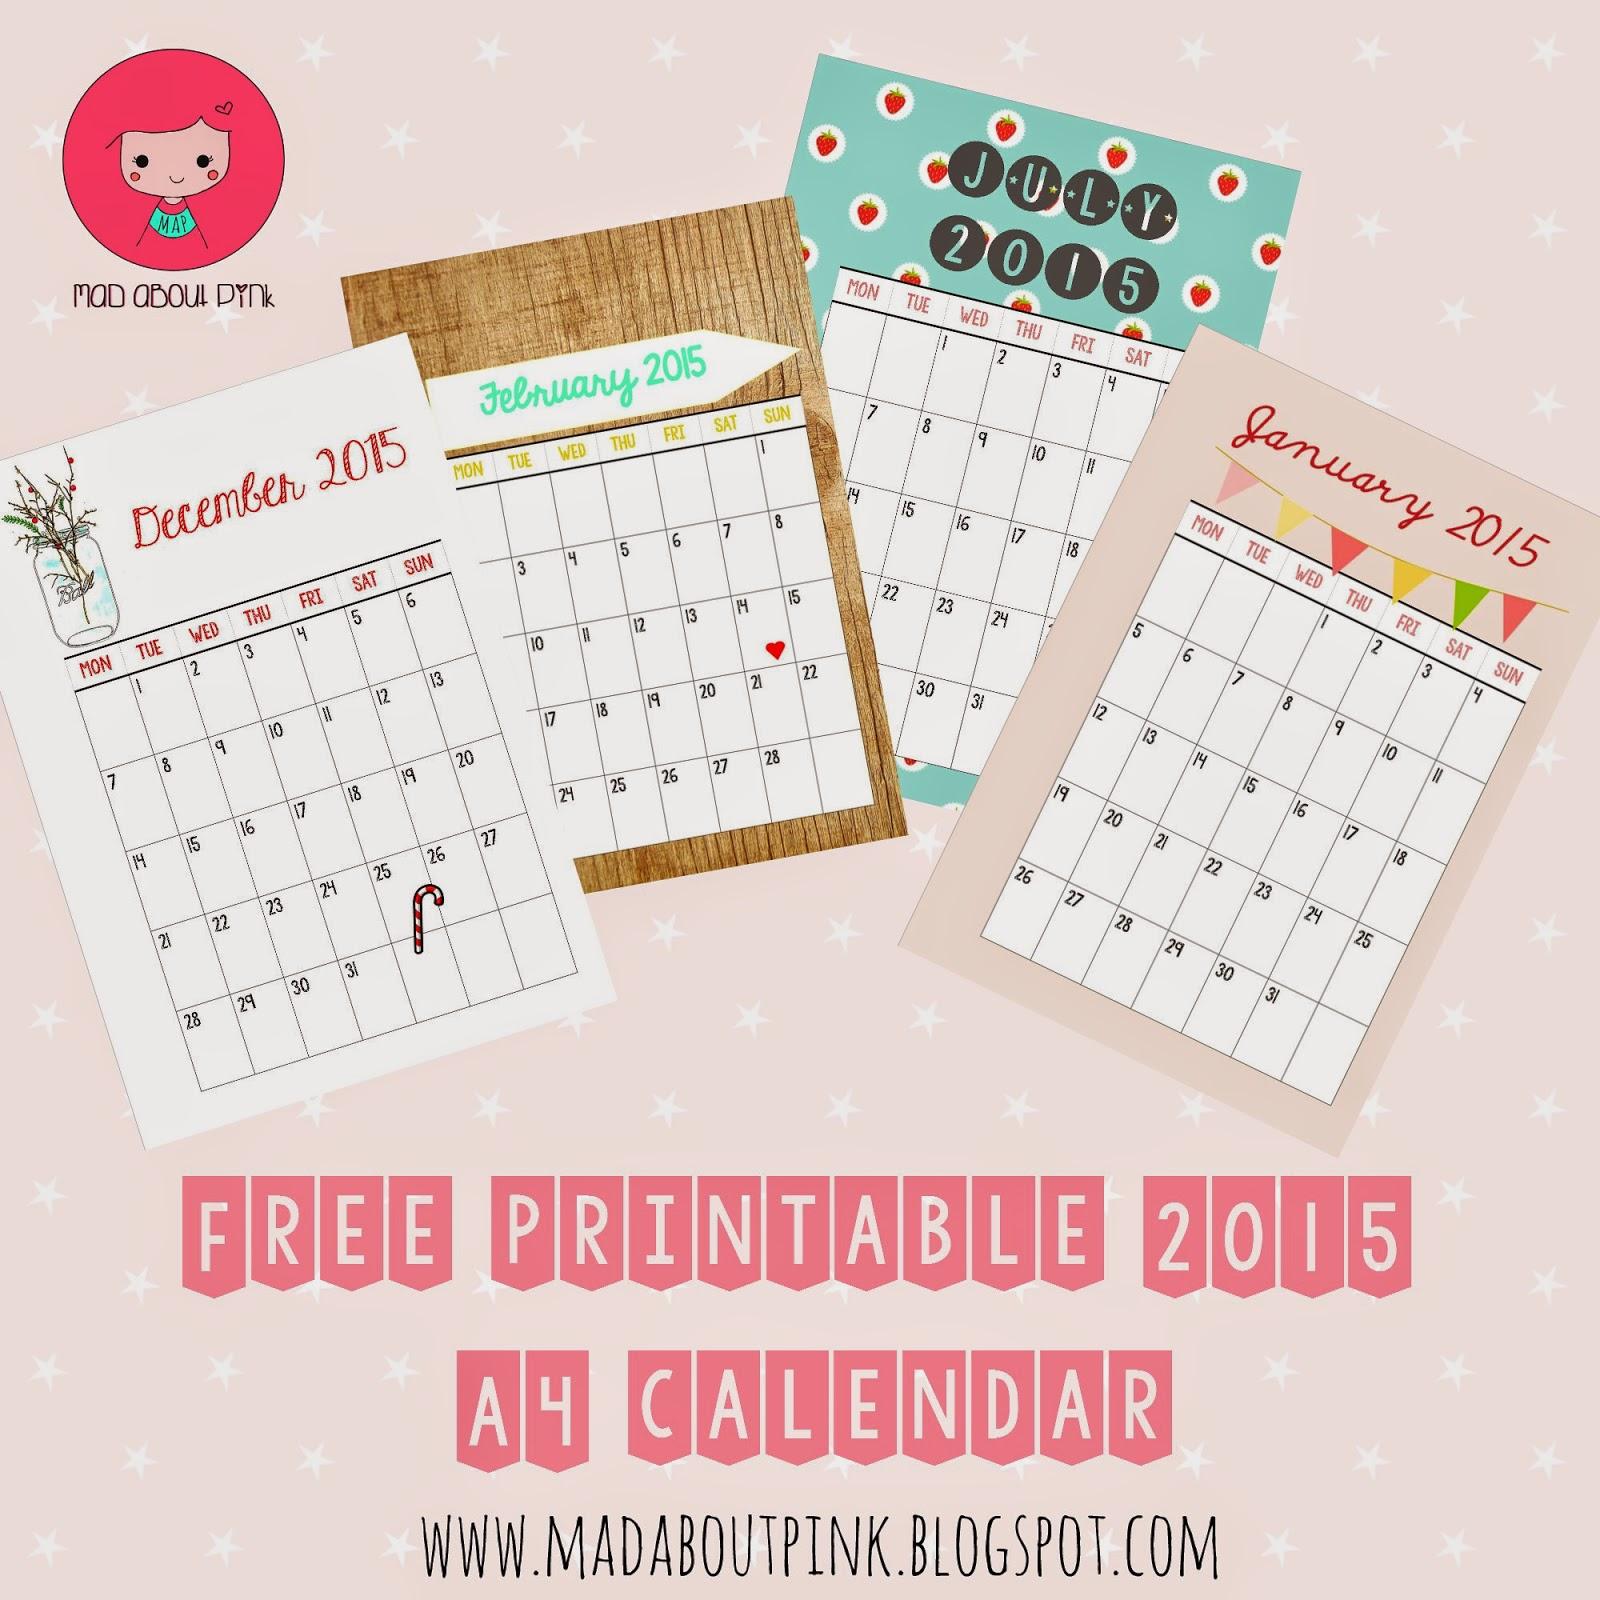 Printable Monthly Planner 2015: 2015 Free Printable Calendars